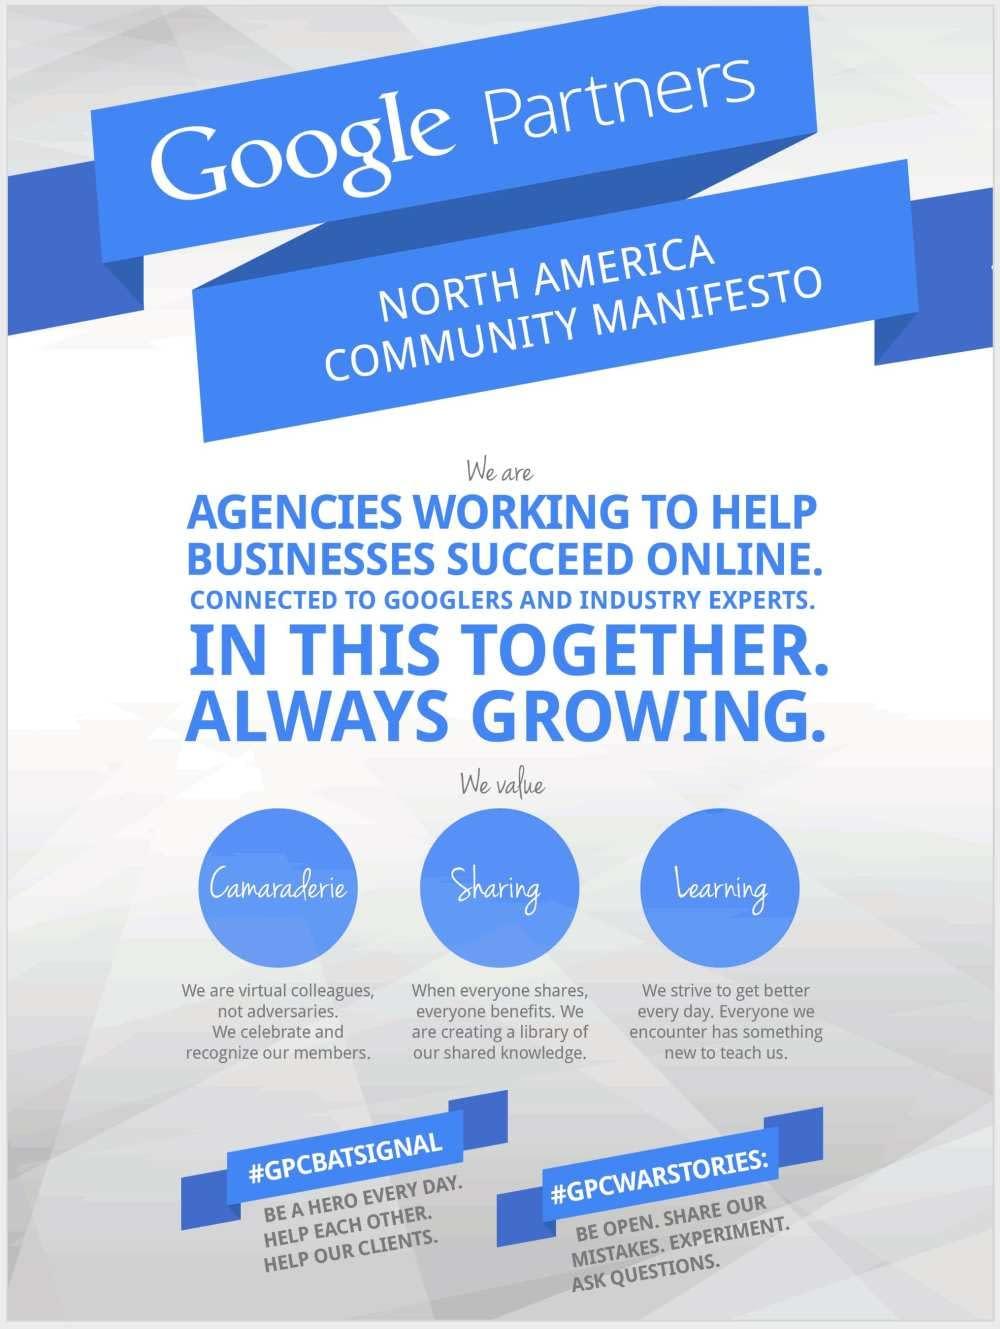 Google Partners Manifesto!